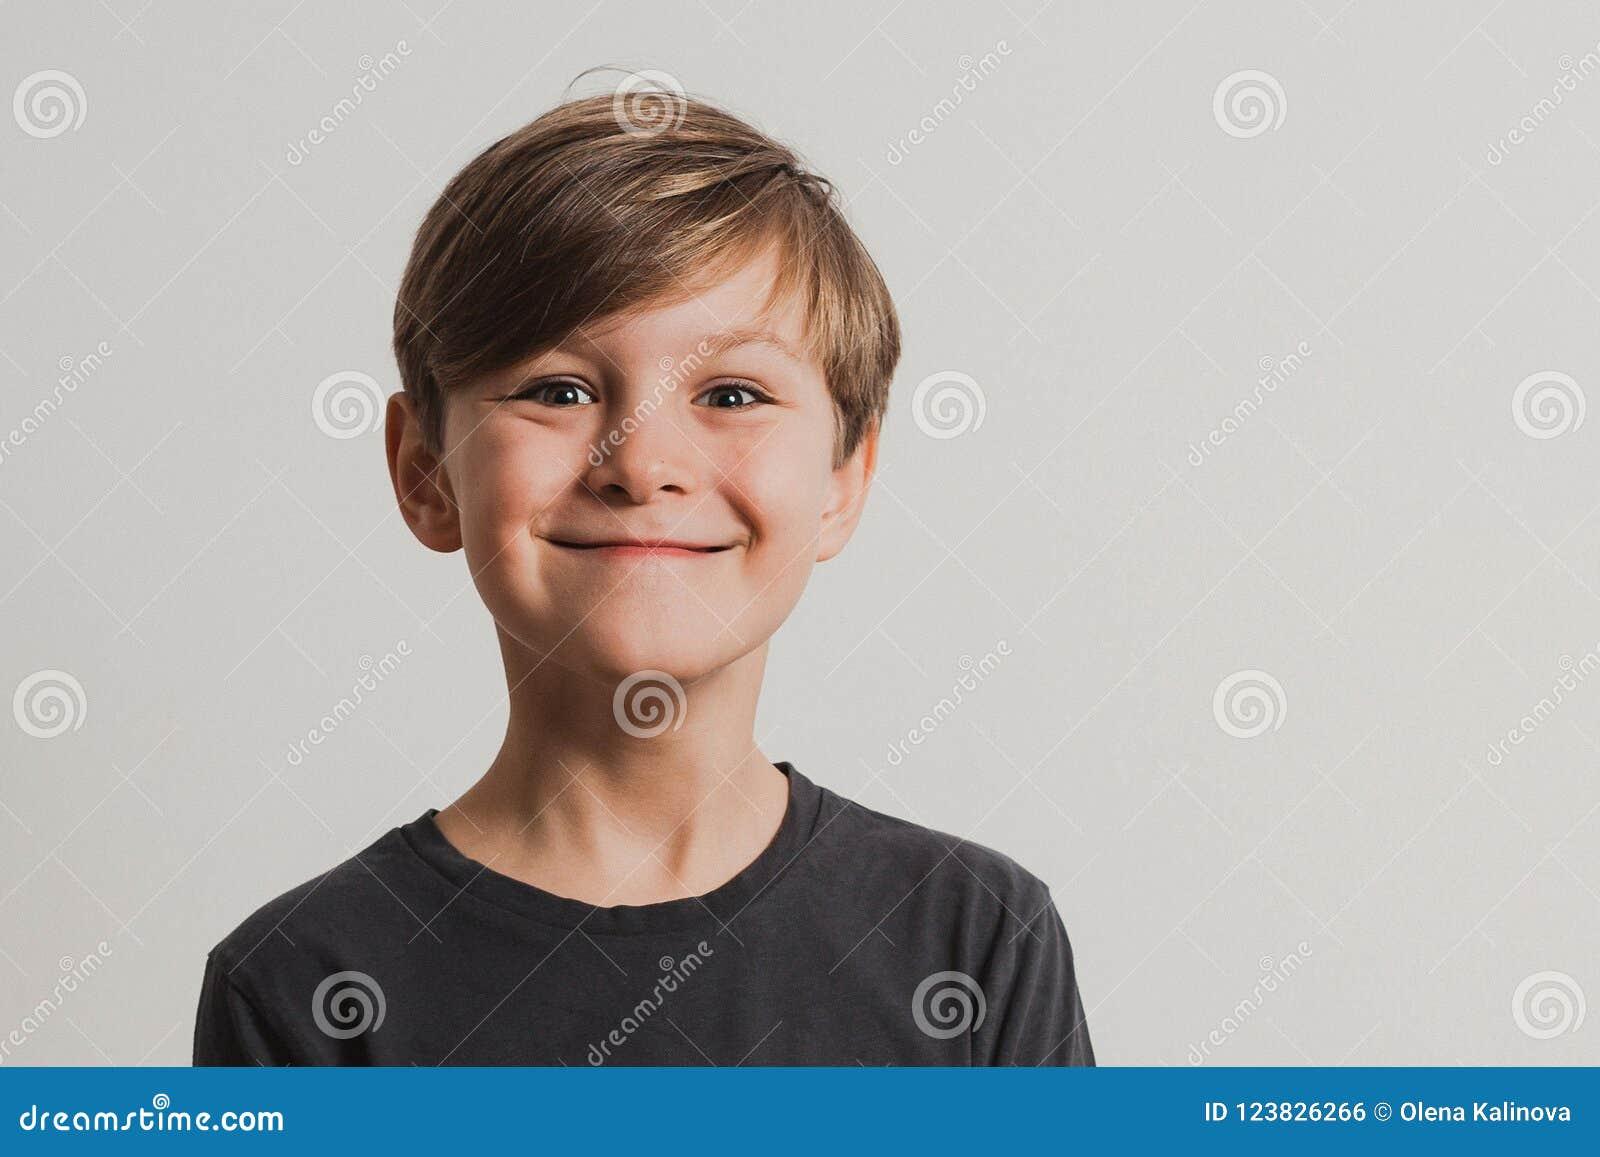 A portrait of cute boy pulling faces